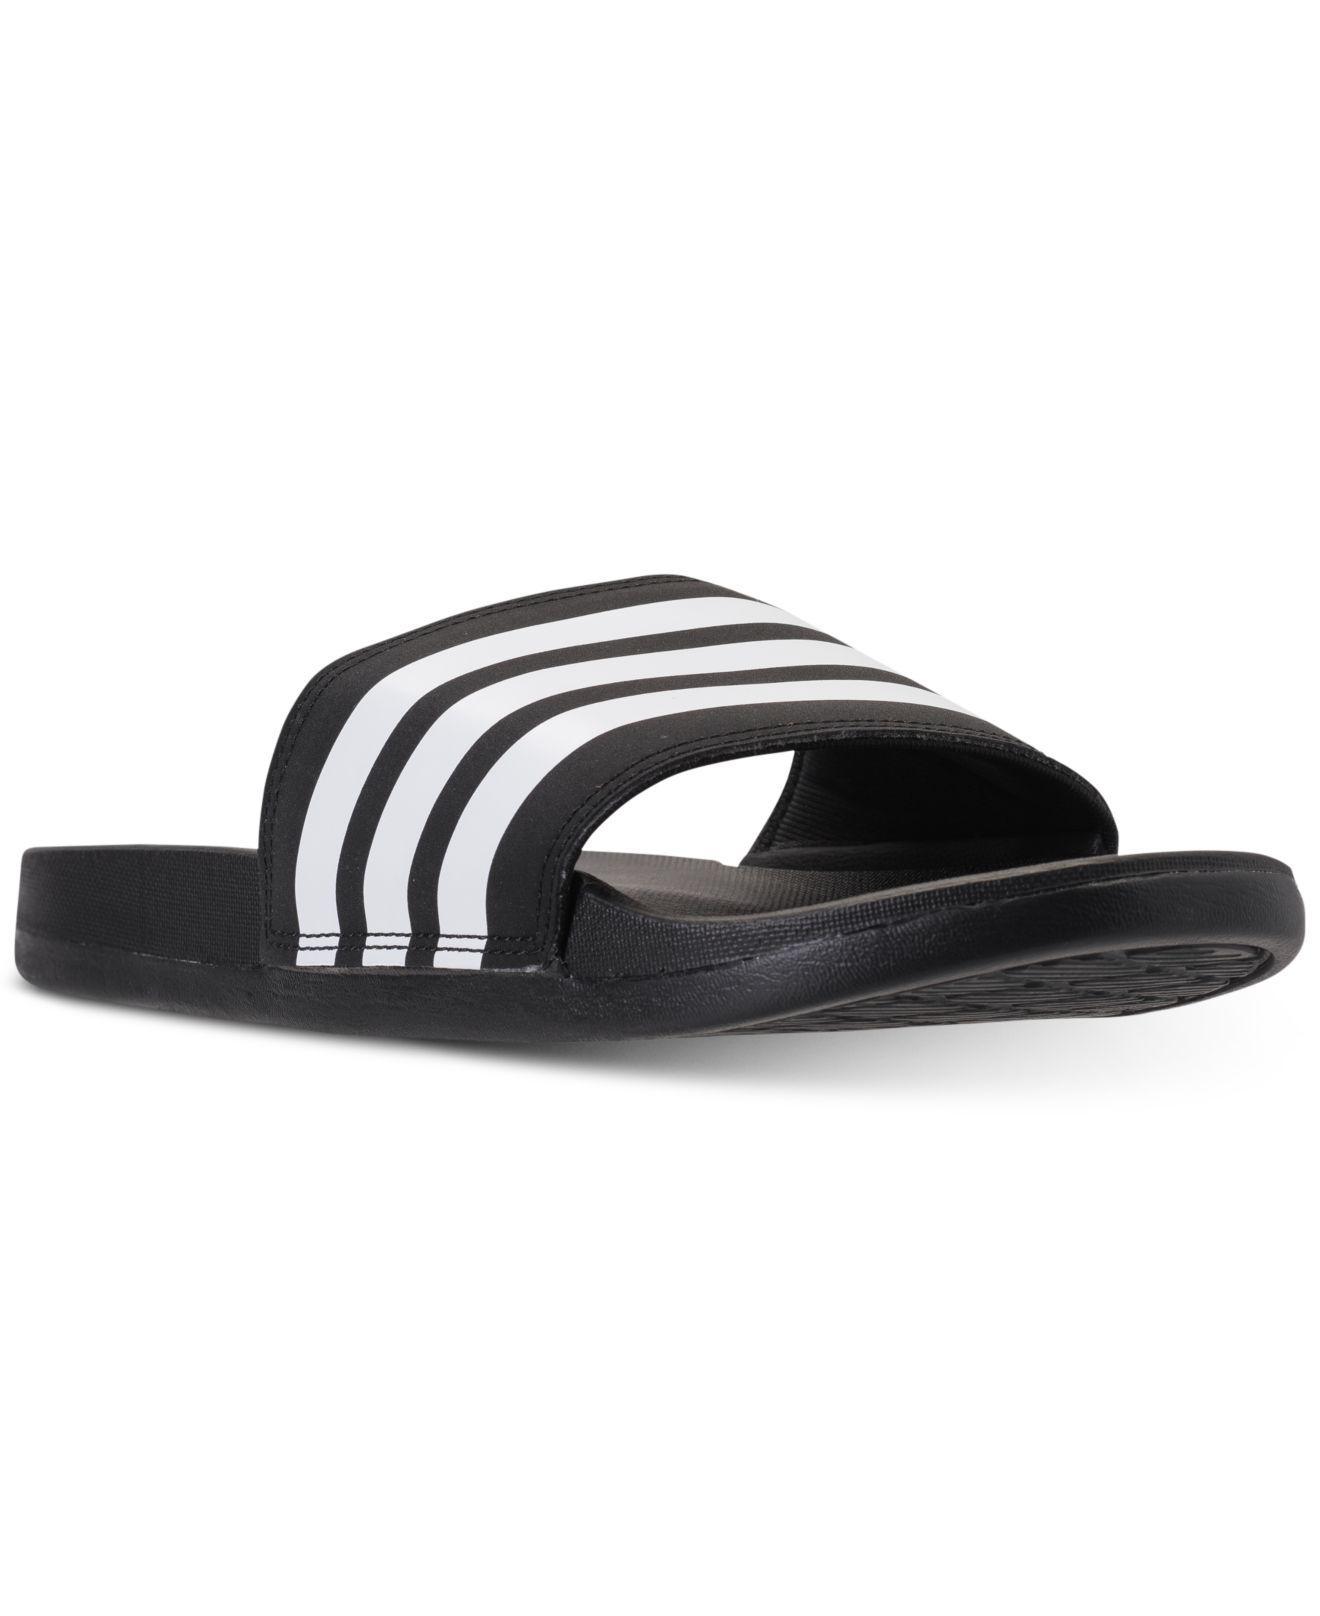 best website 85b44 0e2af adidas. Adilette Cloudfoam Ultra Stripes ...